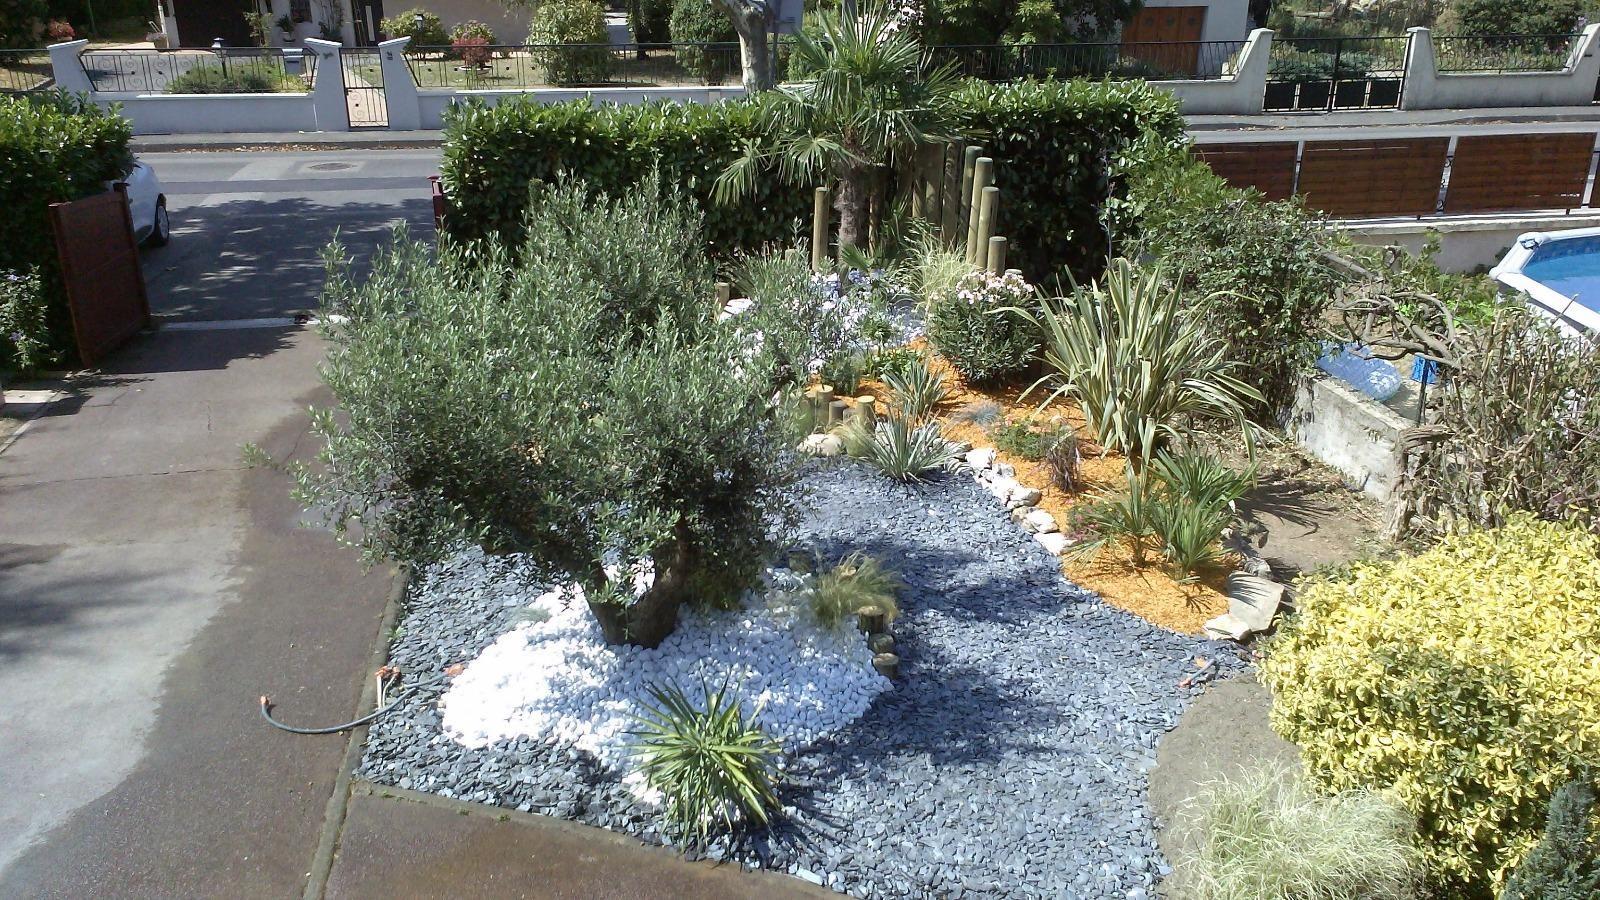 jardin mineral 4 | jardin | pinterest | jardin mineral, jardins et